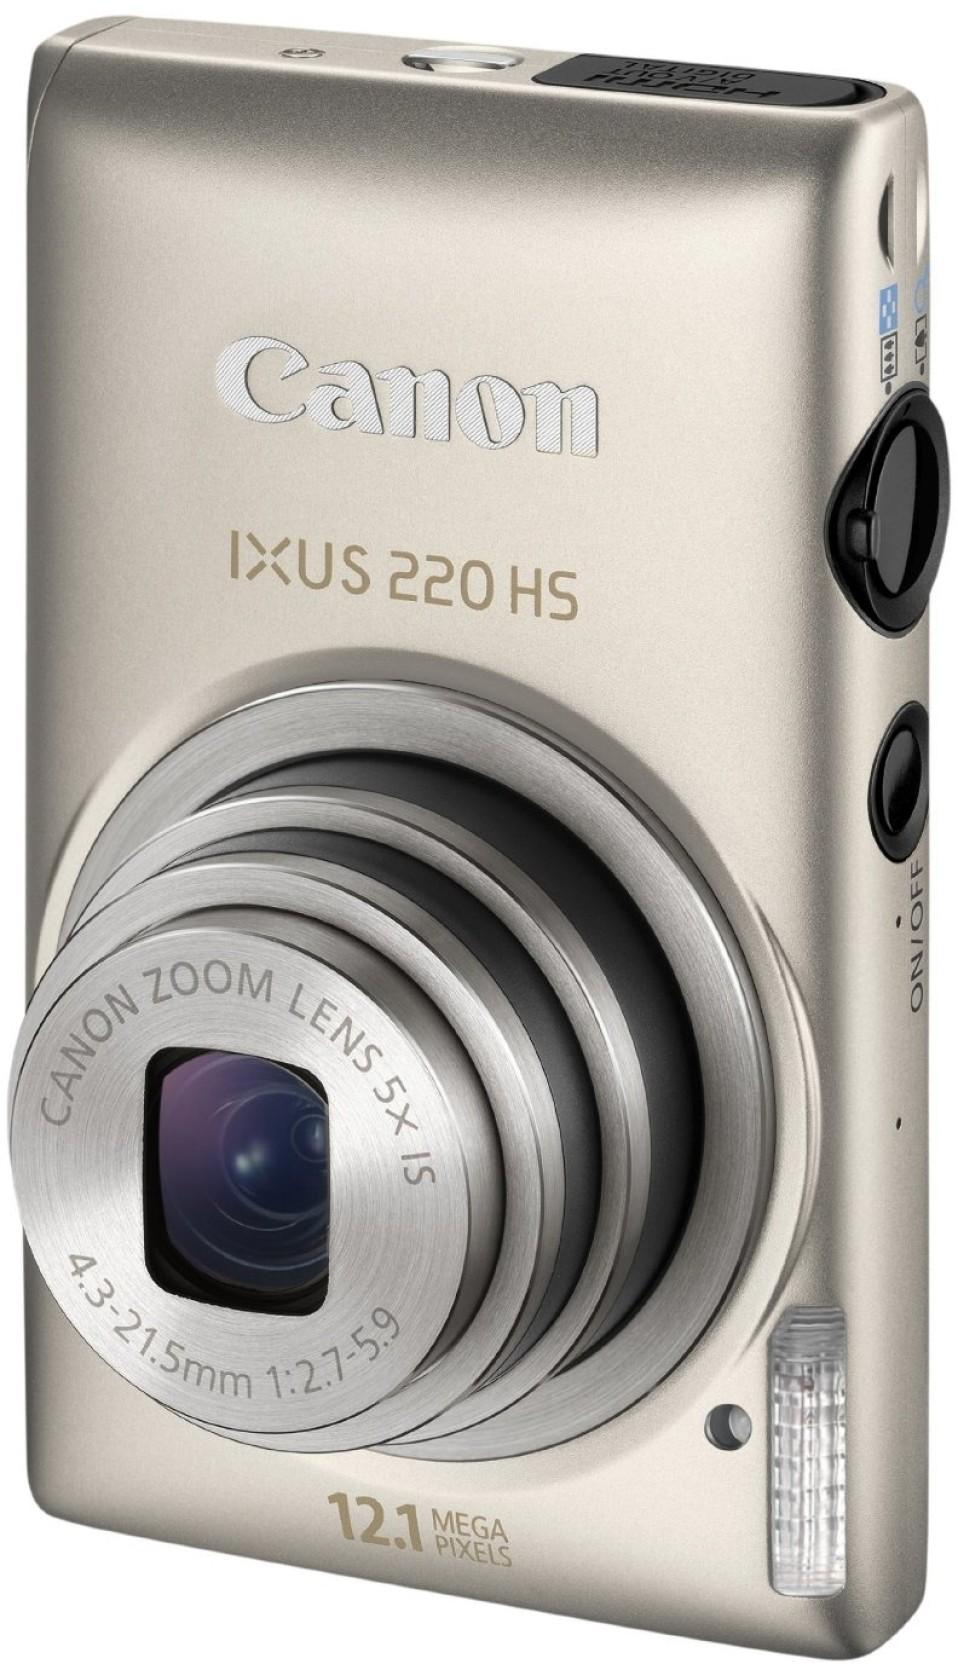 Canon IXUS 220 HS Point & Shoot Camera. Compare